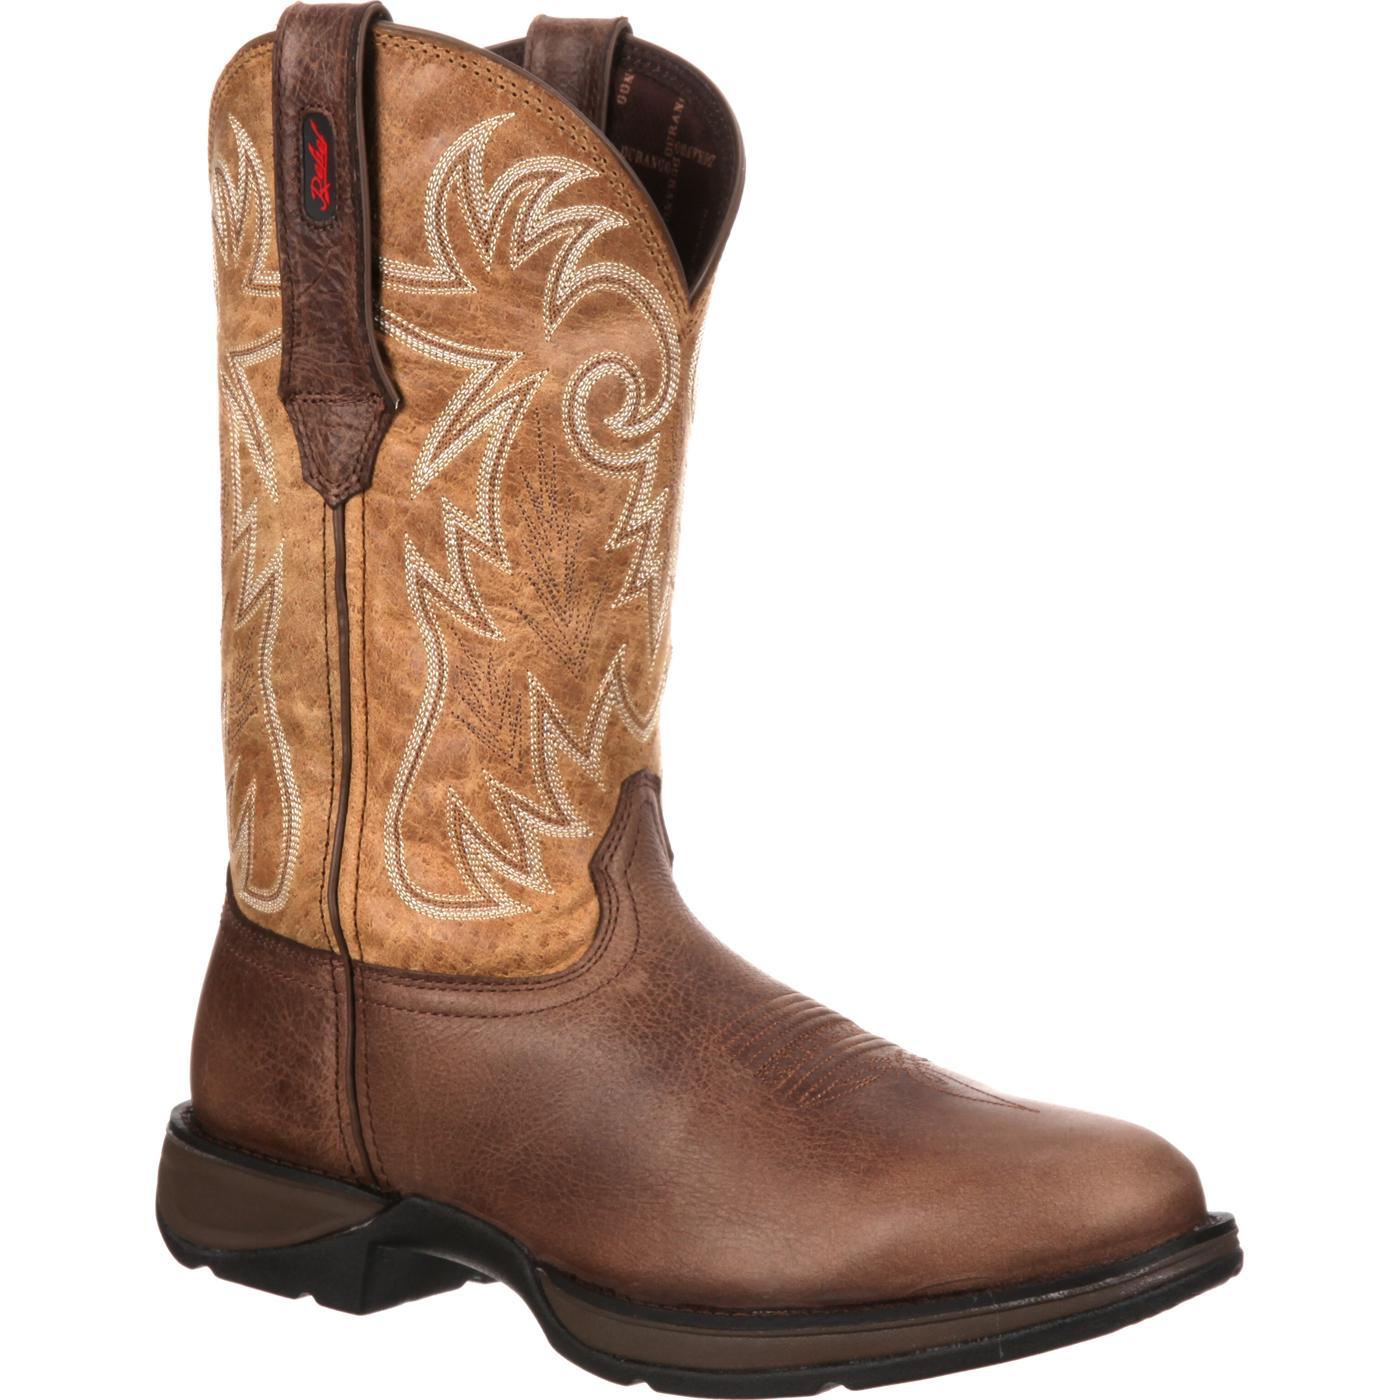 e3f61304f58 Rebel by Durango Steel Toe Western Boot